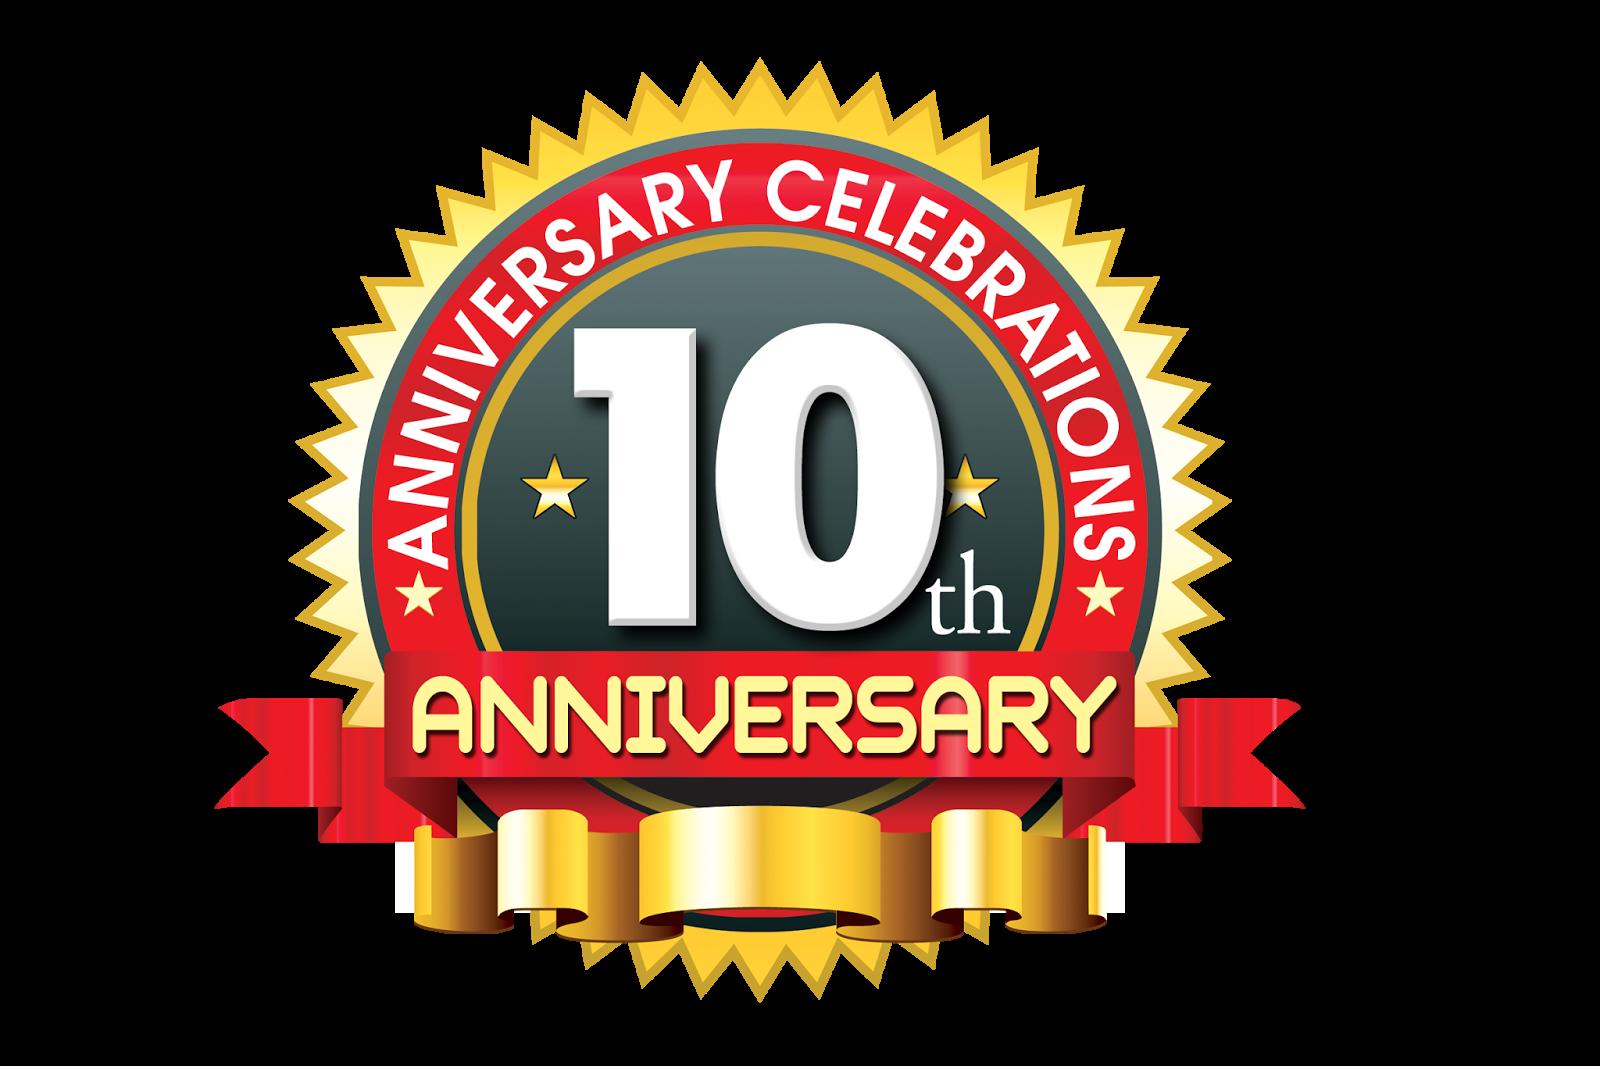 Years anniversary colorful vector logo design naveengfx